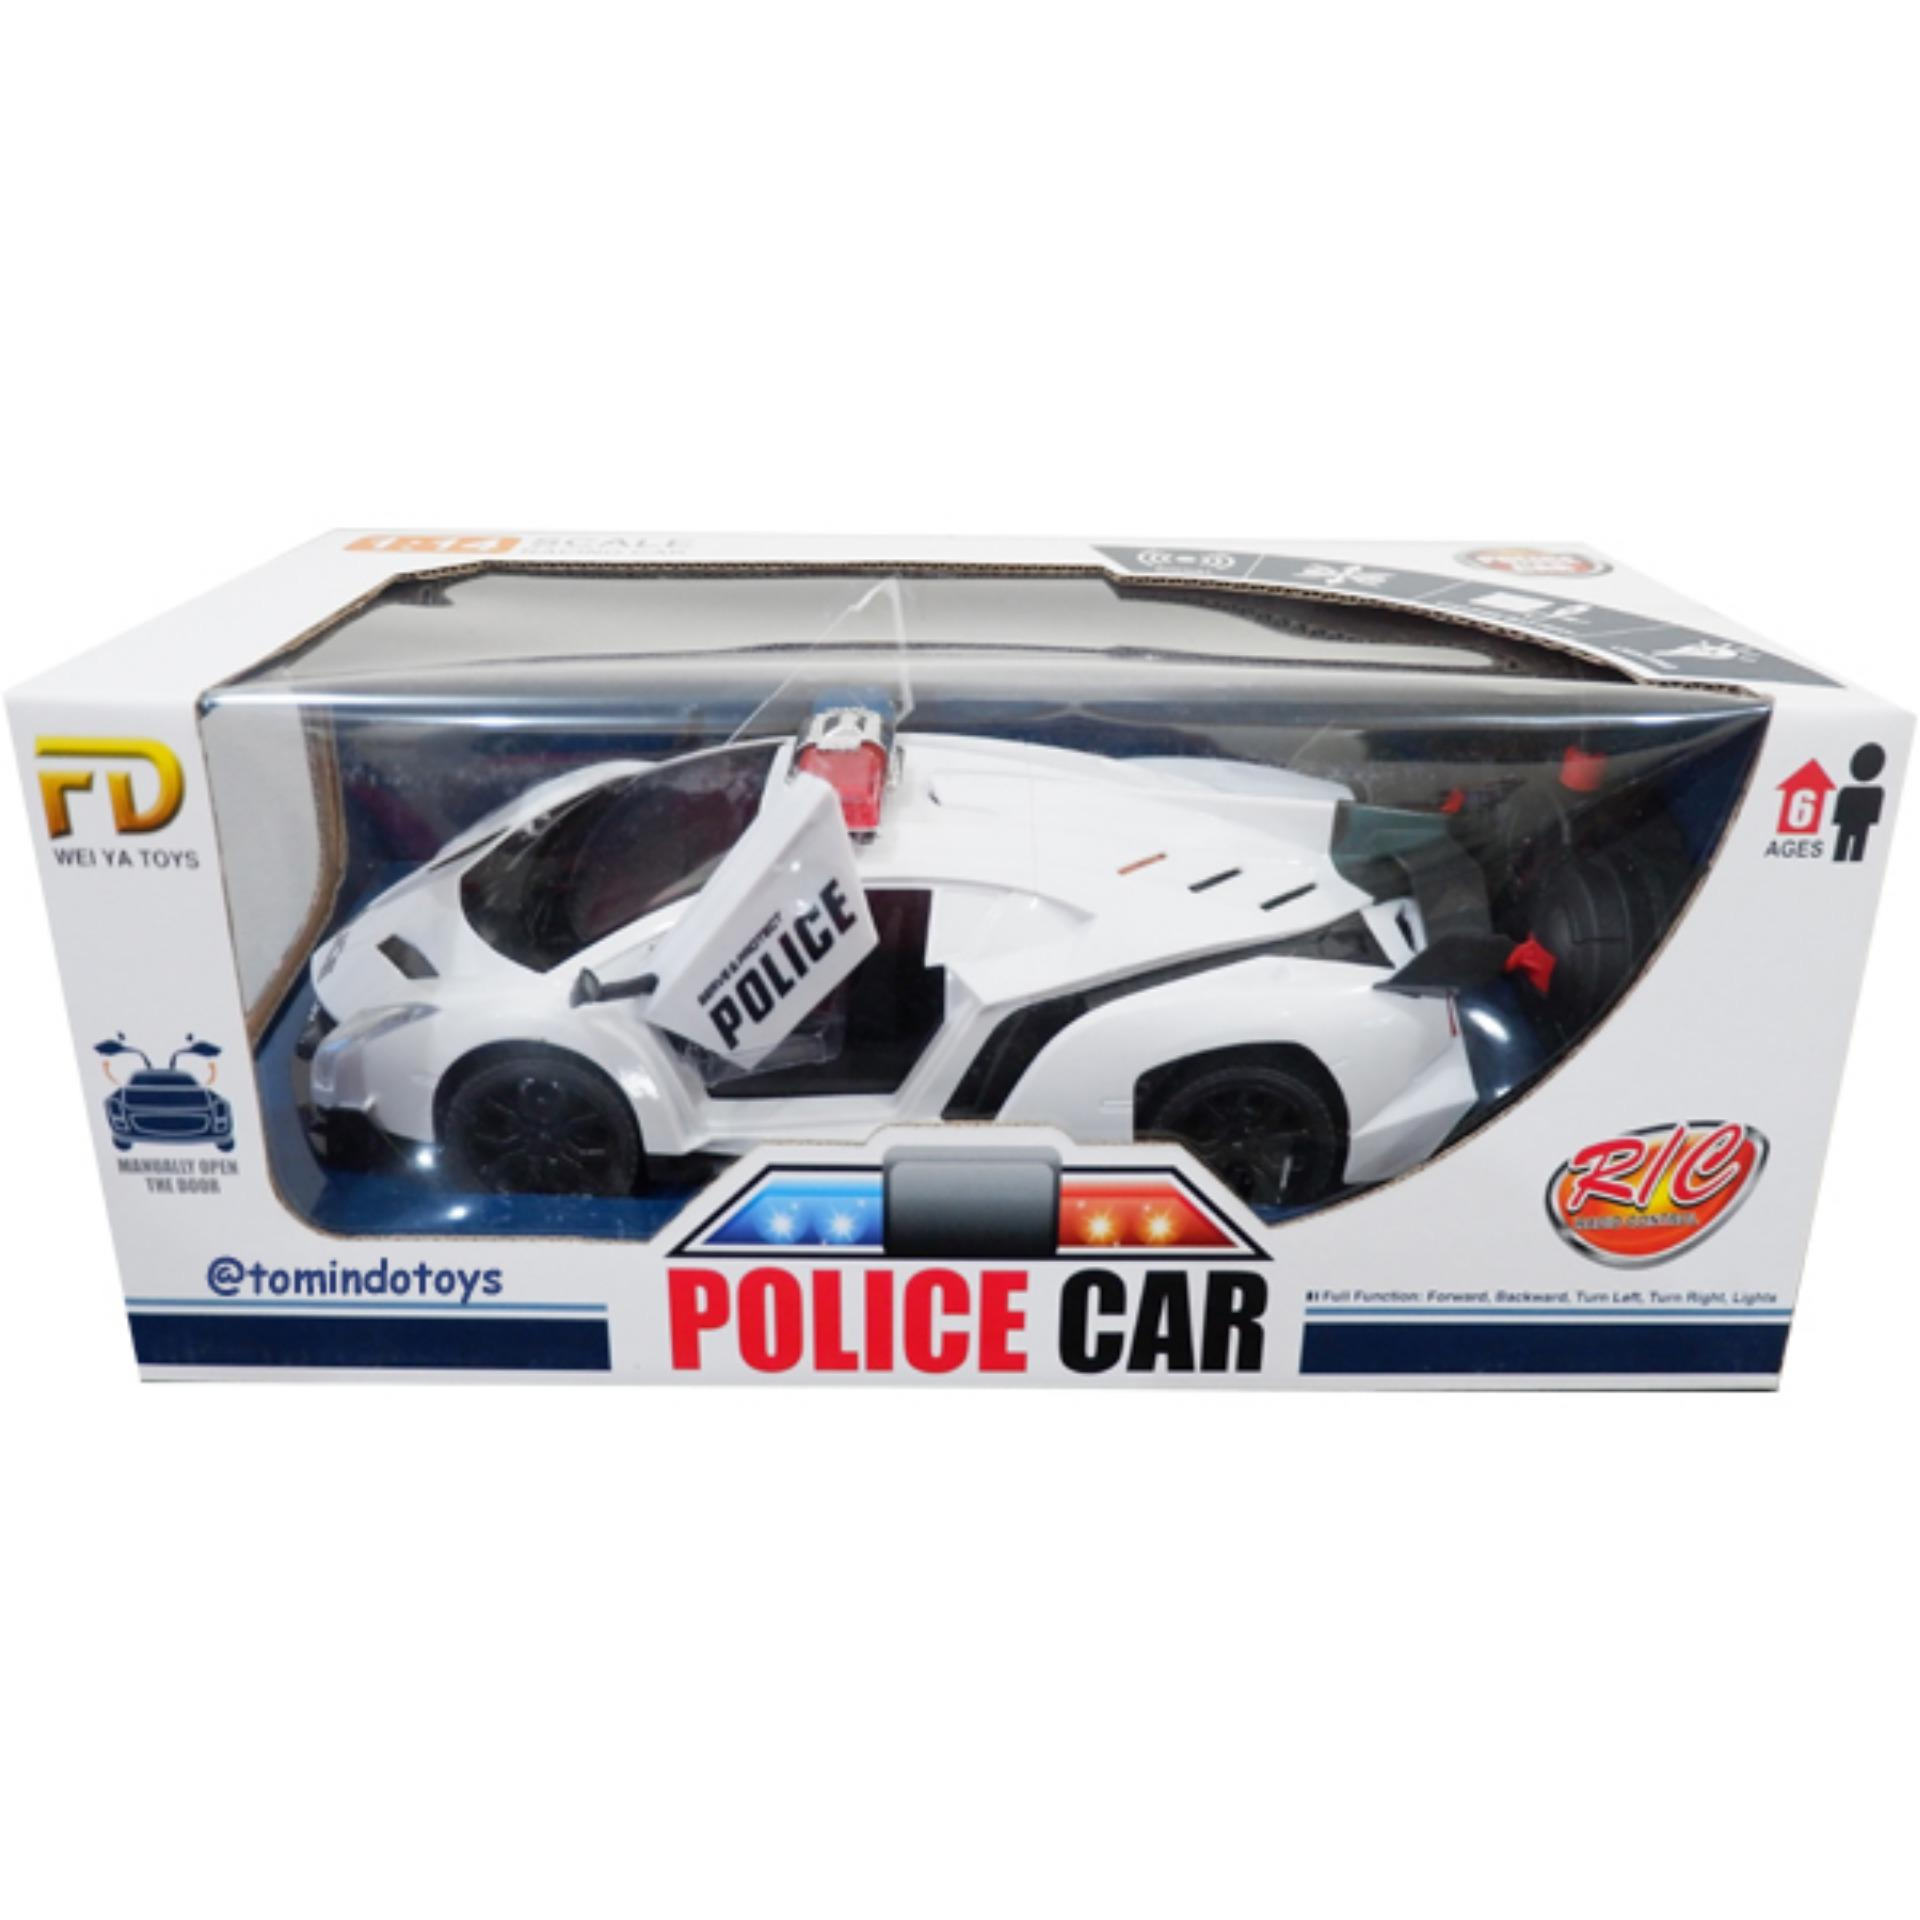 Jual Tomindo Mobil Remote Control Police Car Fd065A Mainan Anak Mobil Remote Mobil Remot Grosir